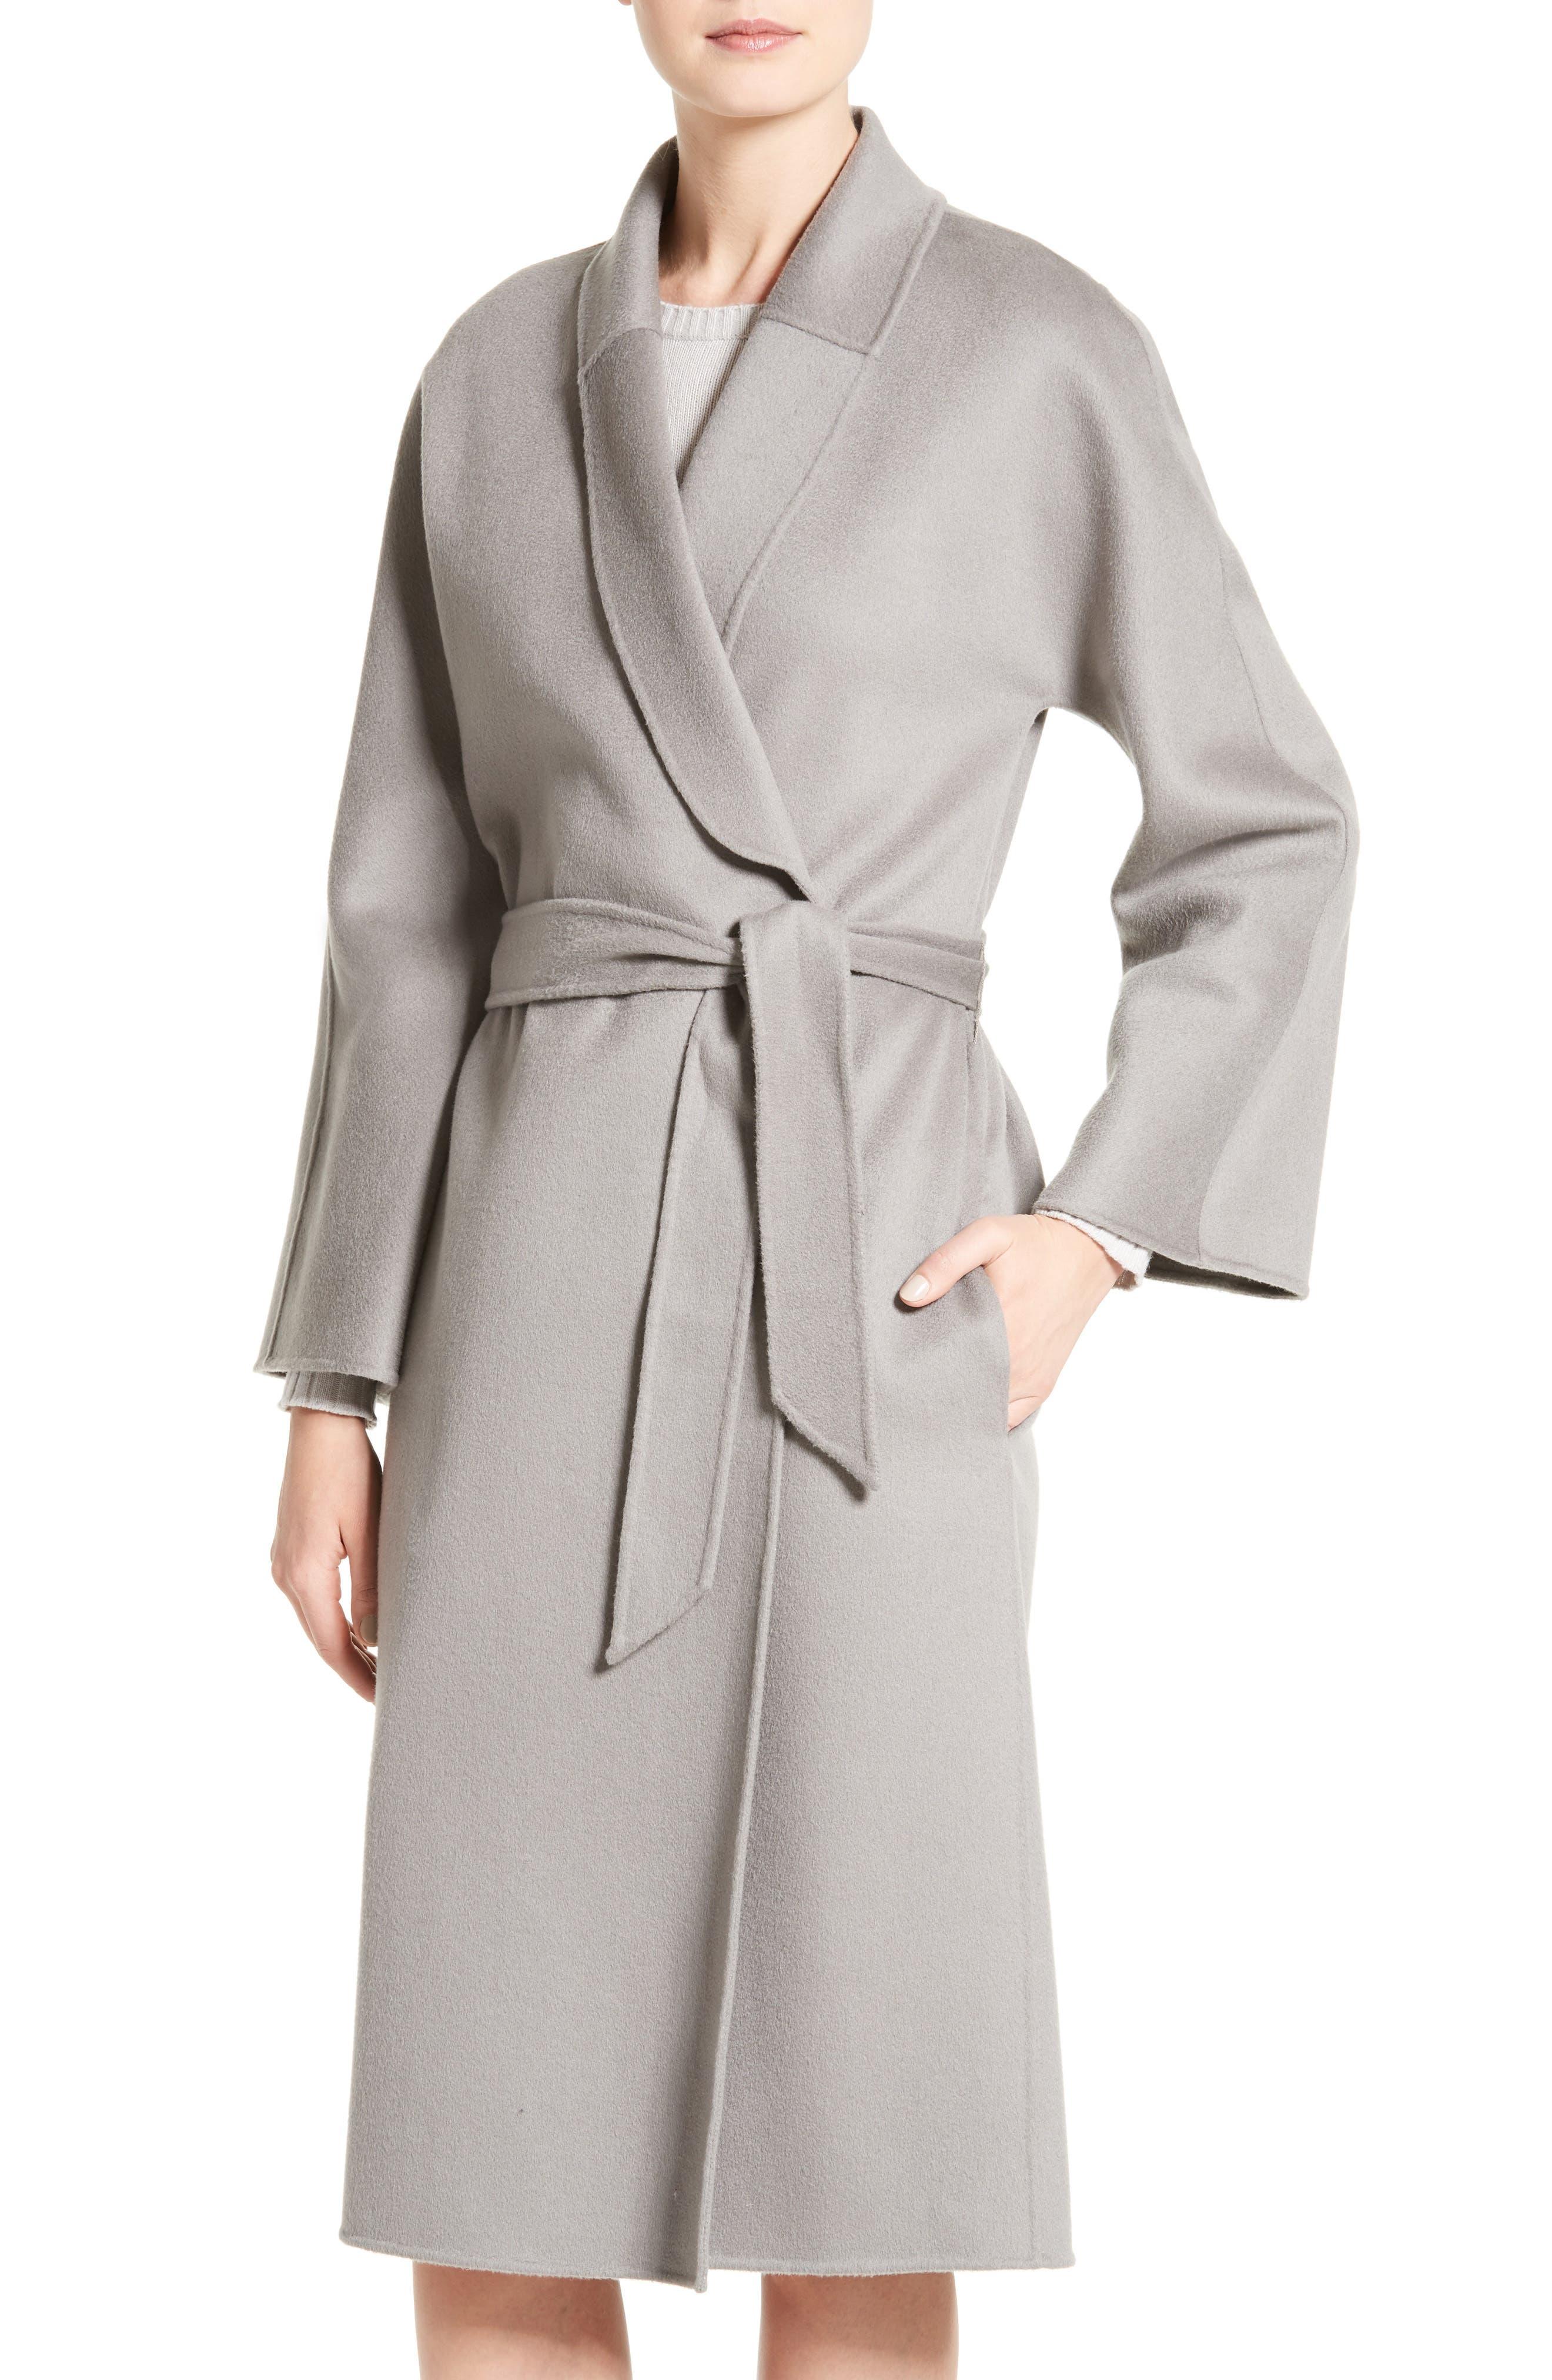 Alternate Image 1 Selected - Armani Collezioni Double Face Cashmere Wrap Coat